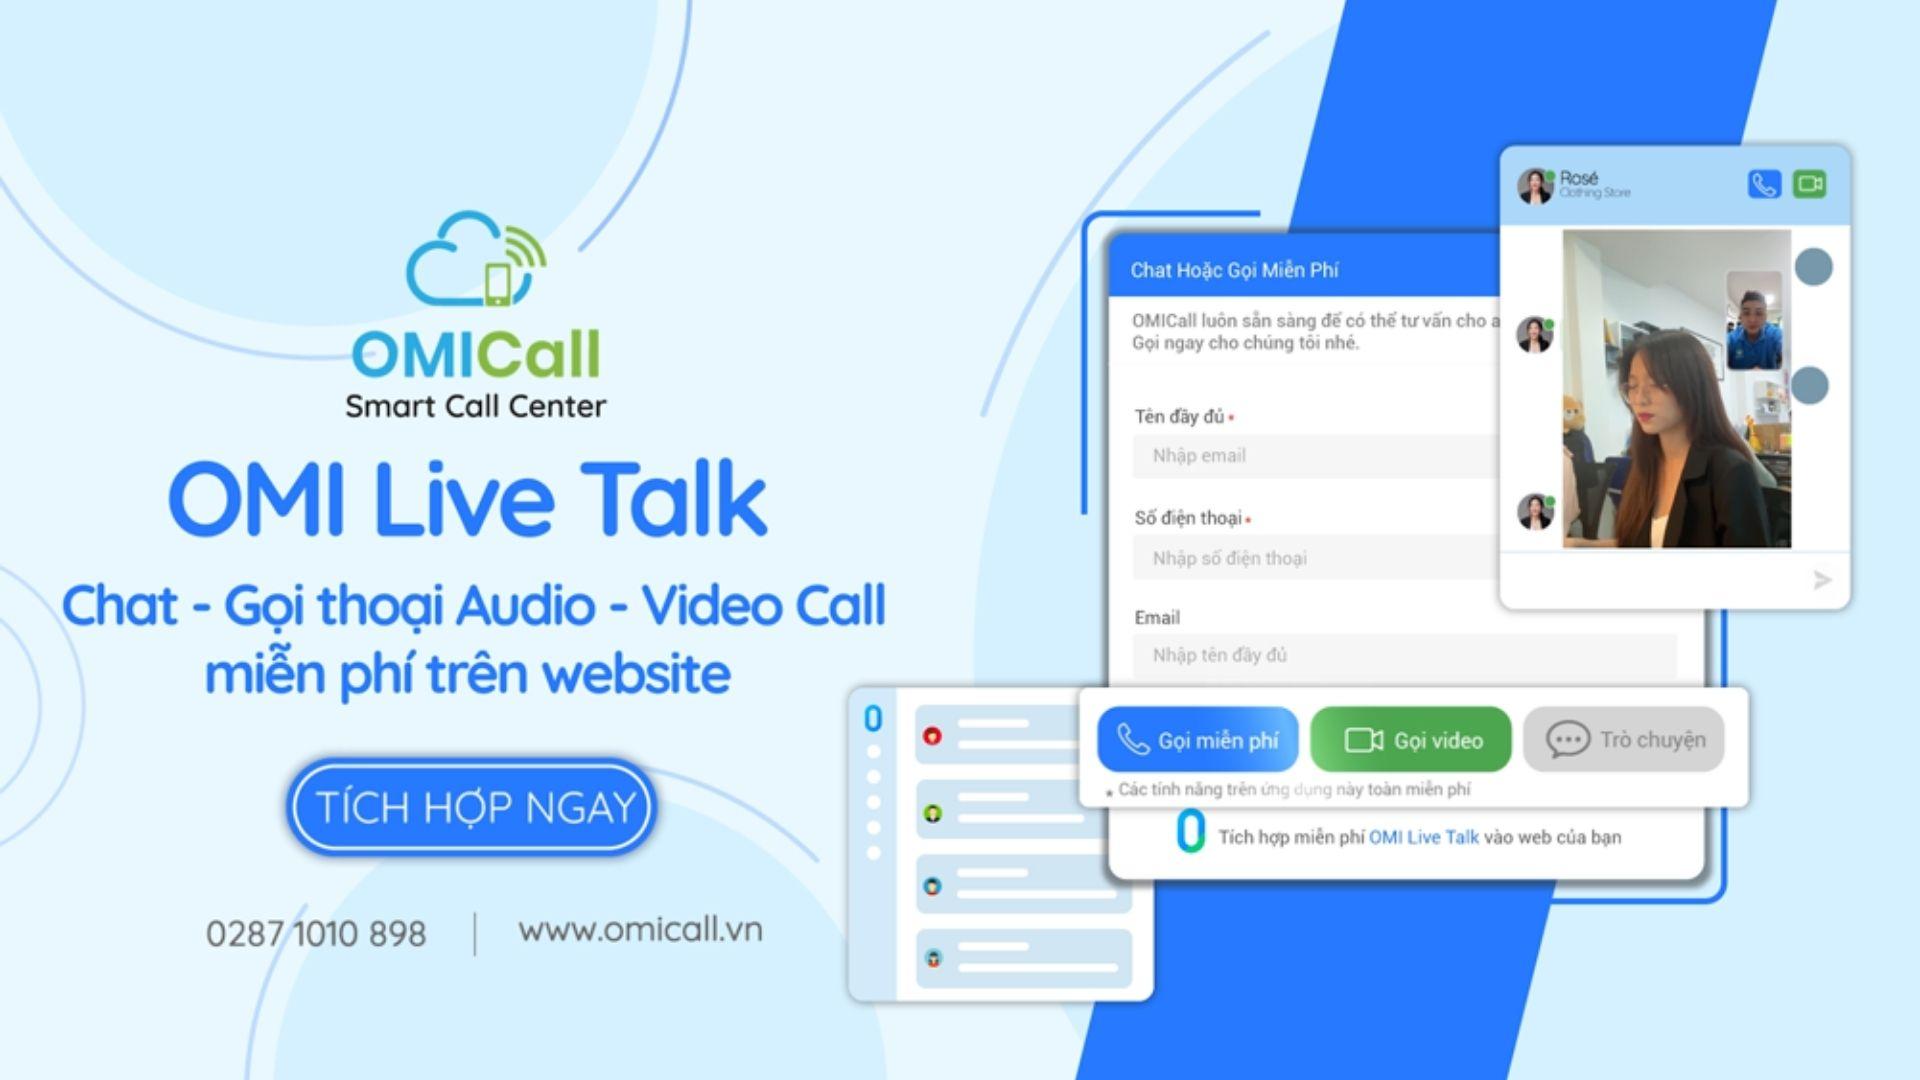 omi-live-talk-3-trong-1